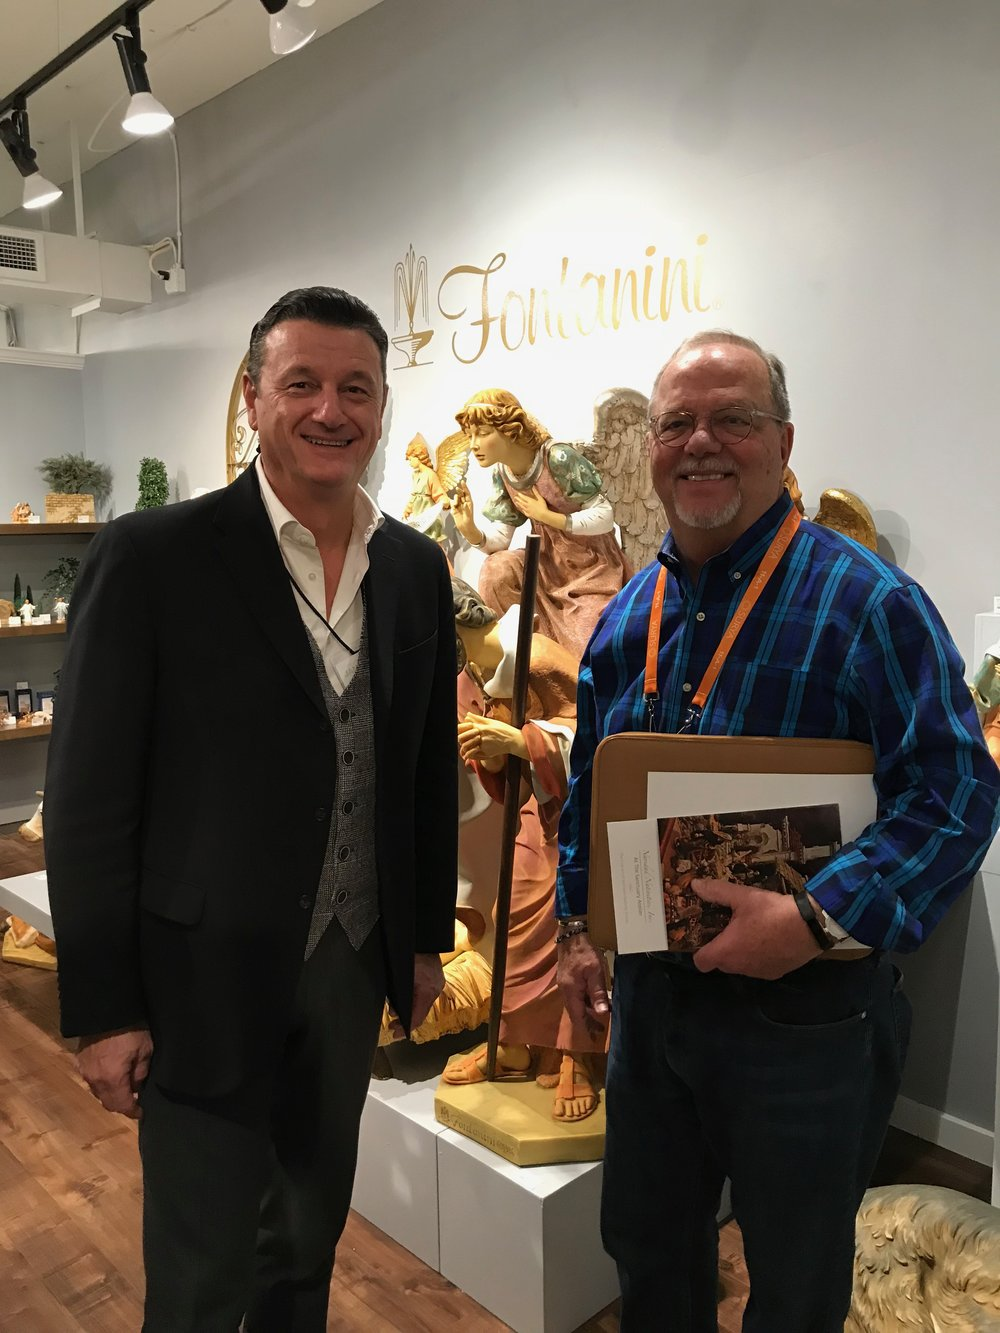 Michael meeting with Emmanuel Fontanini